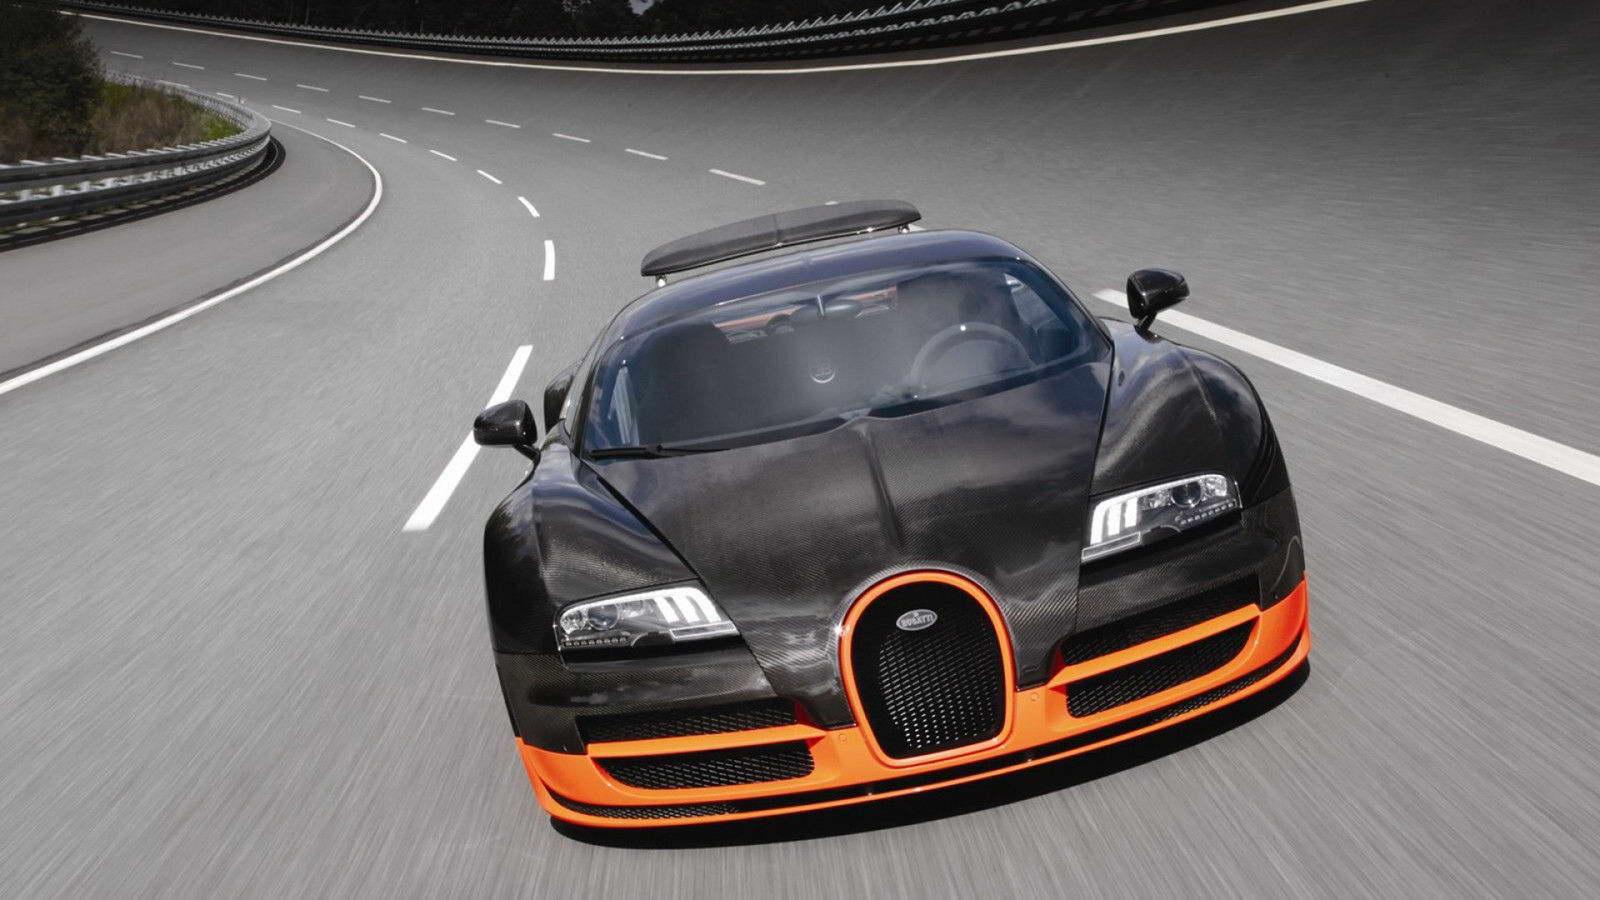 Bugatti Veyron Super Sports Car Hd High Quality